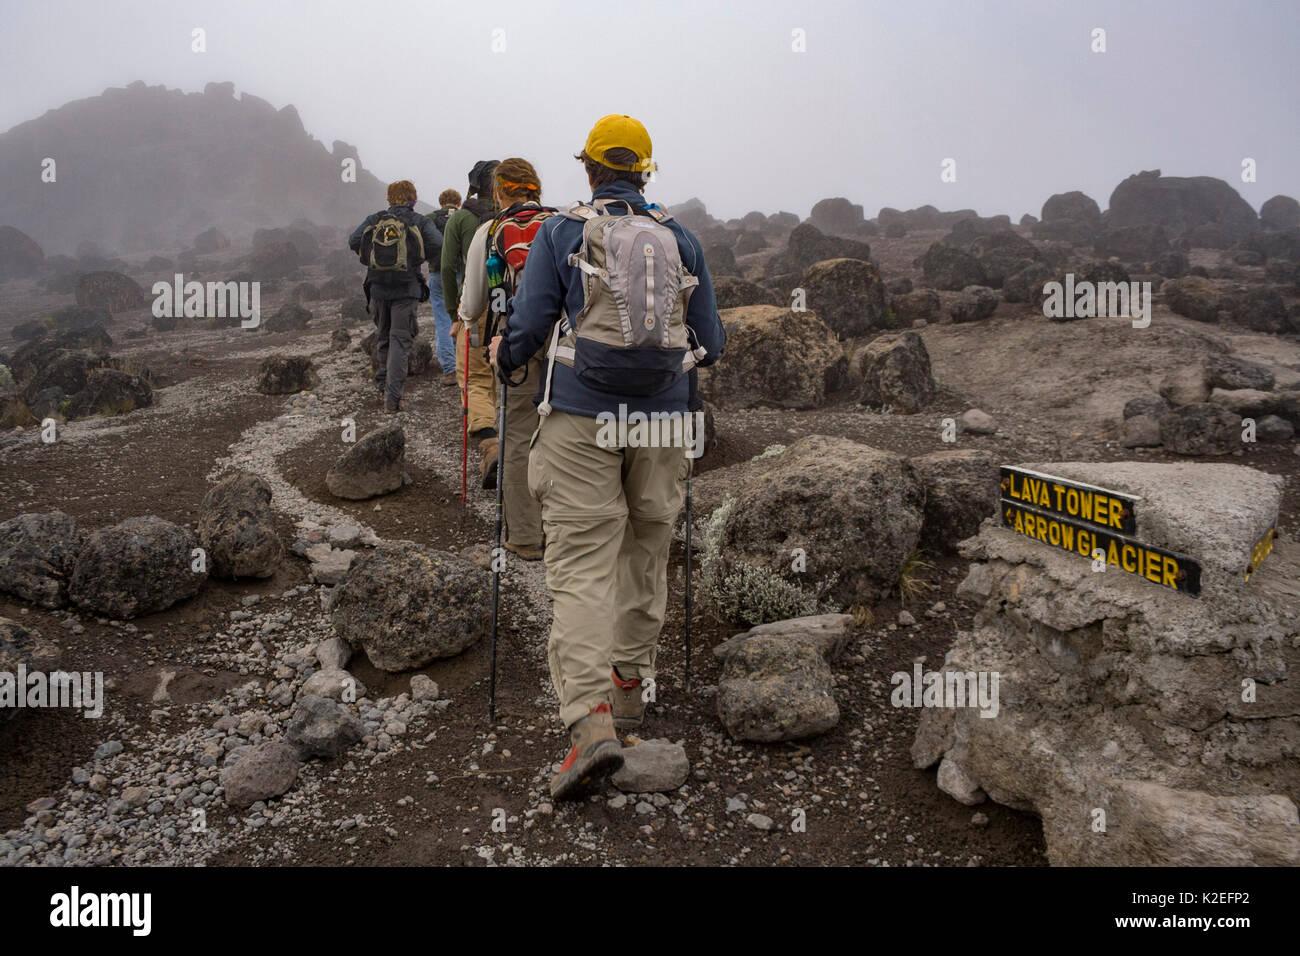 Hikers along the Machame Route, Mount Kilimanjaro, Tanzania. May 2008 - Stock Image